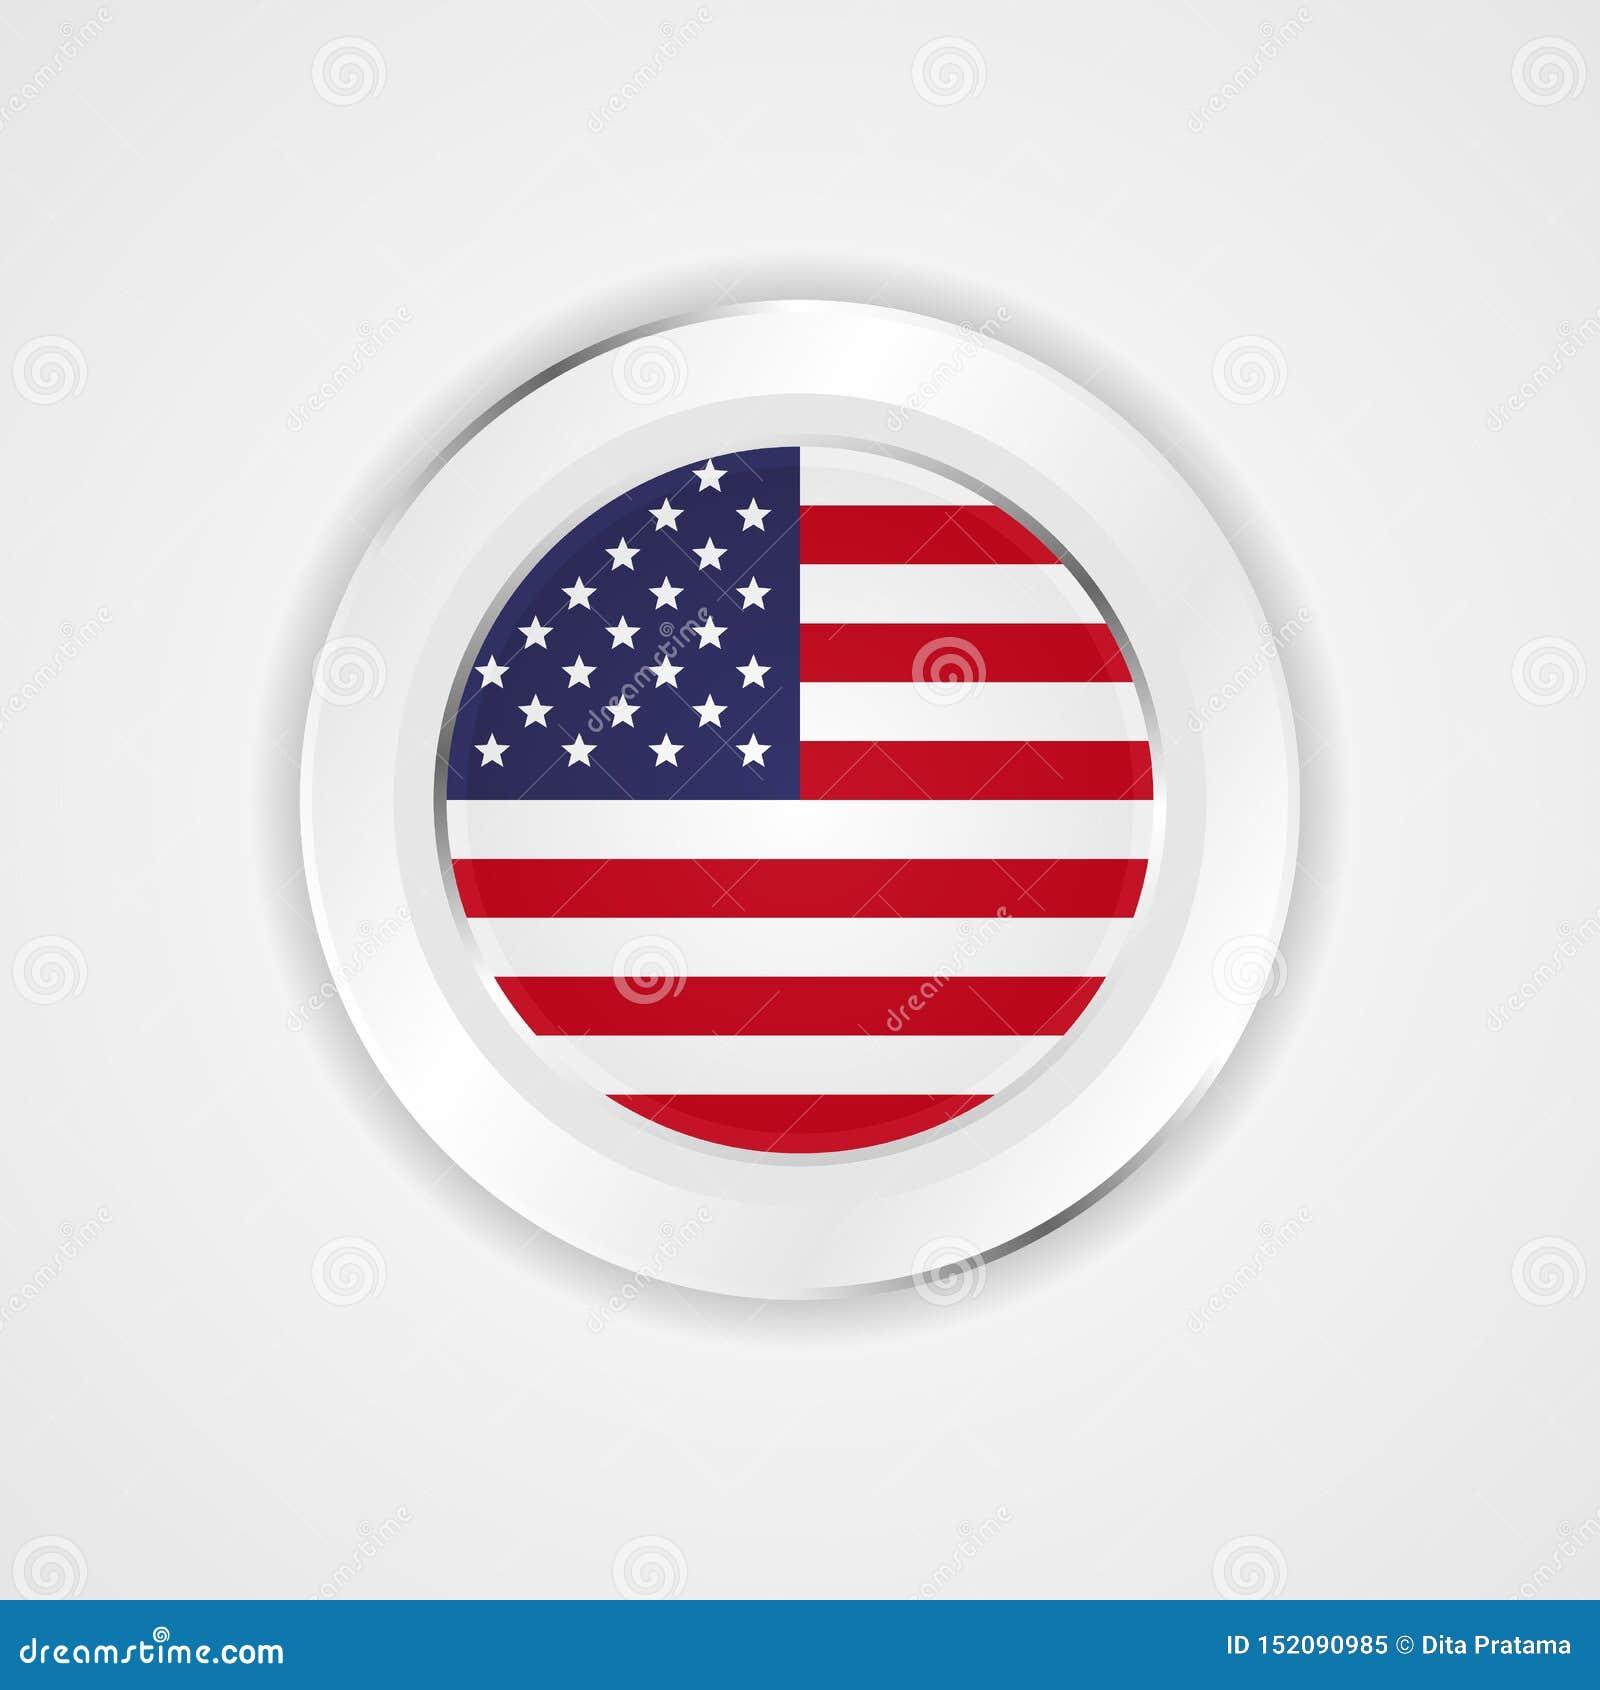 Bandeira de Estados Unidos da América no ícone lustroso